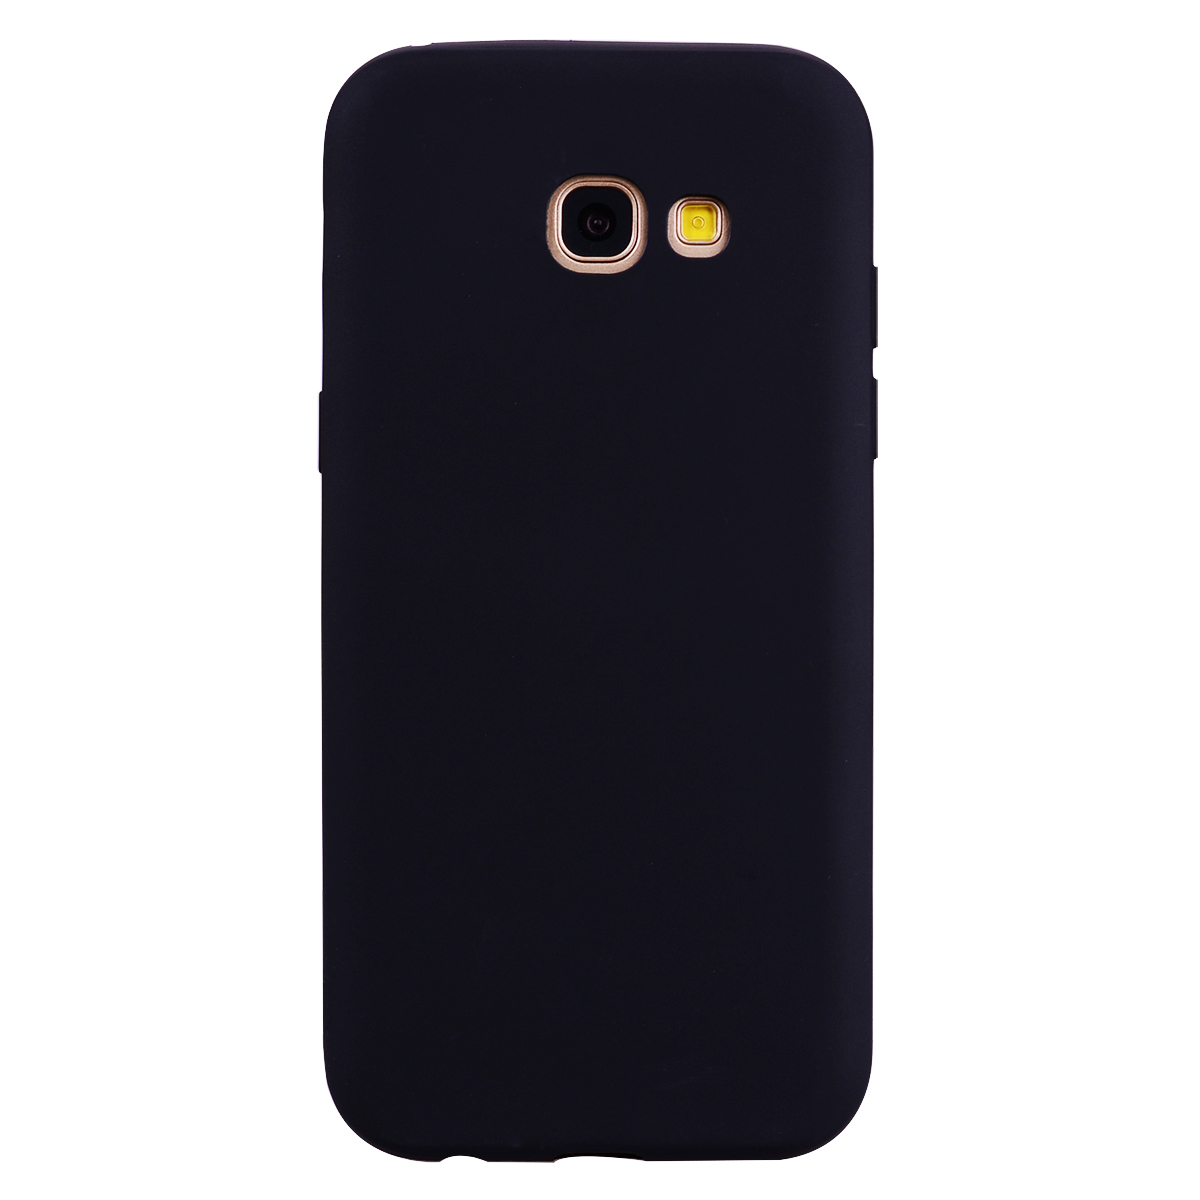 for Samsung A5 2017 Cute Candy Color Matte TPU Anti-scratch Non-slip Protective Cover Back Case black